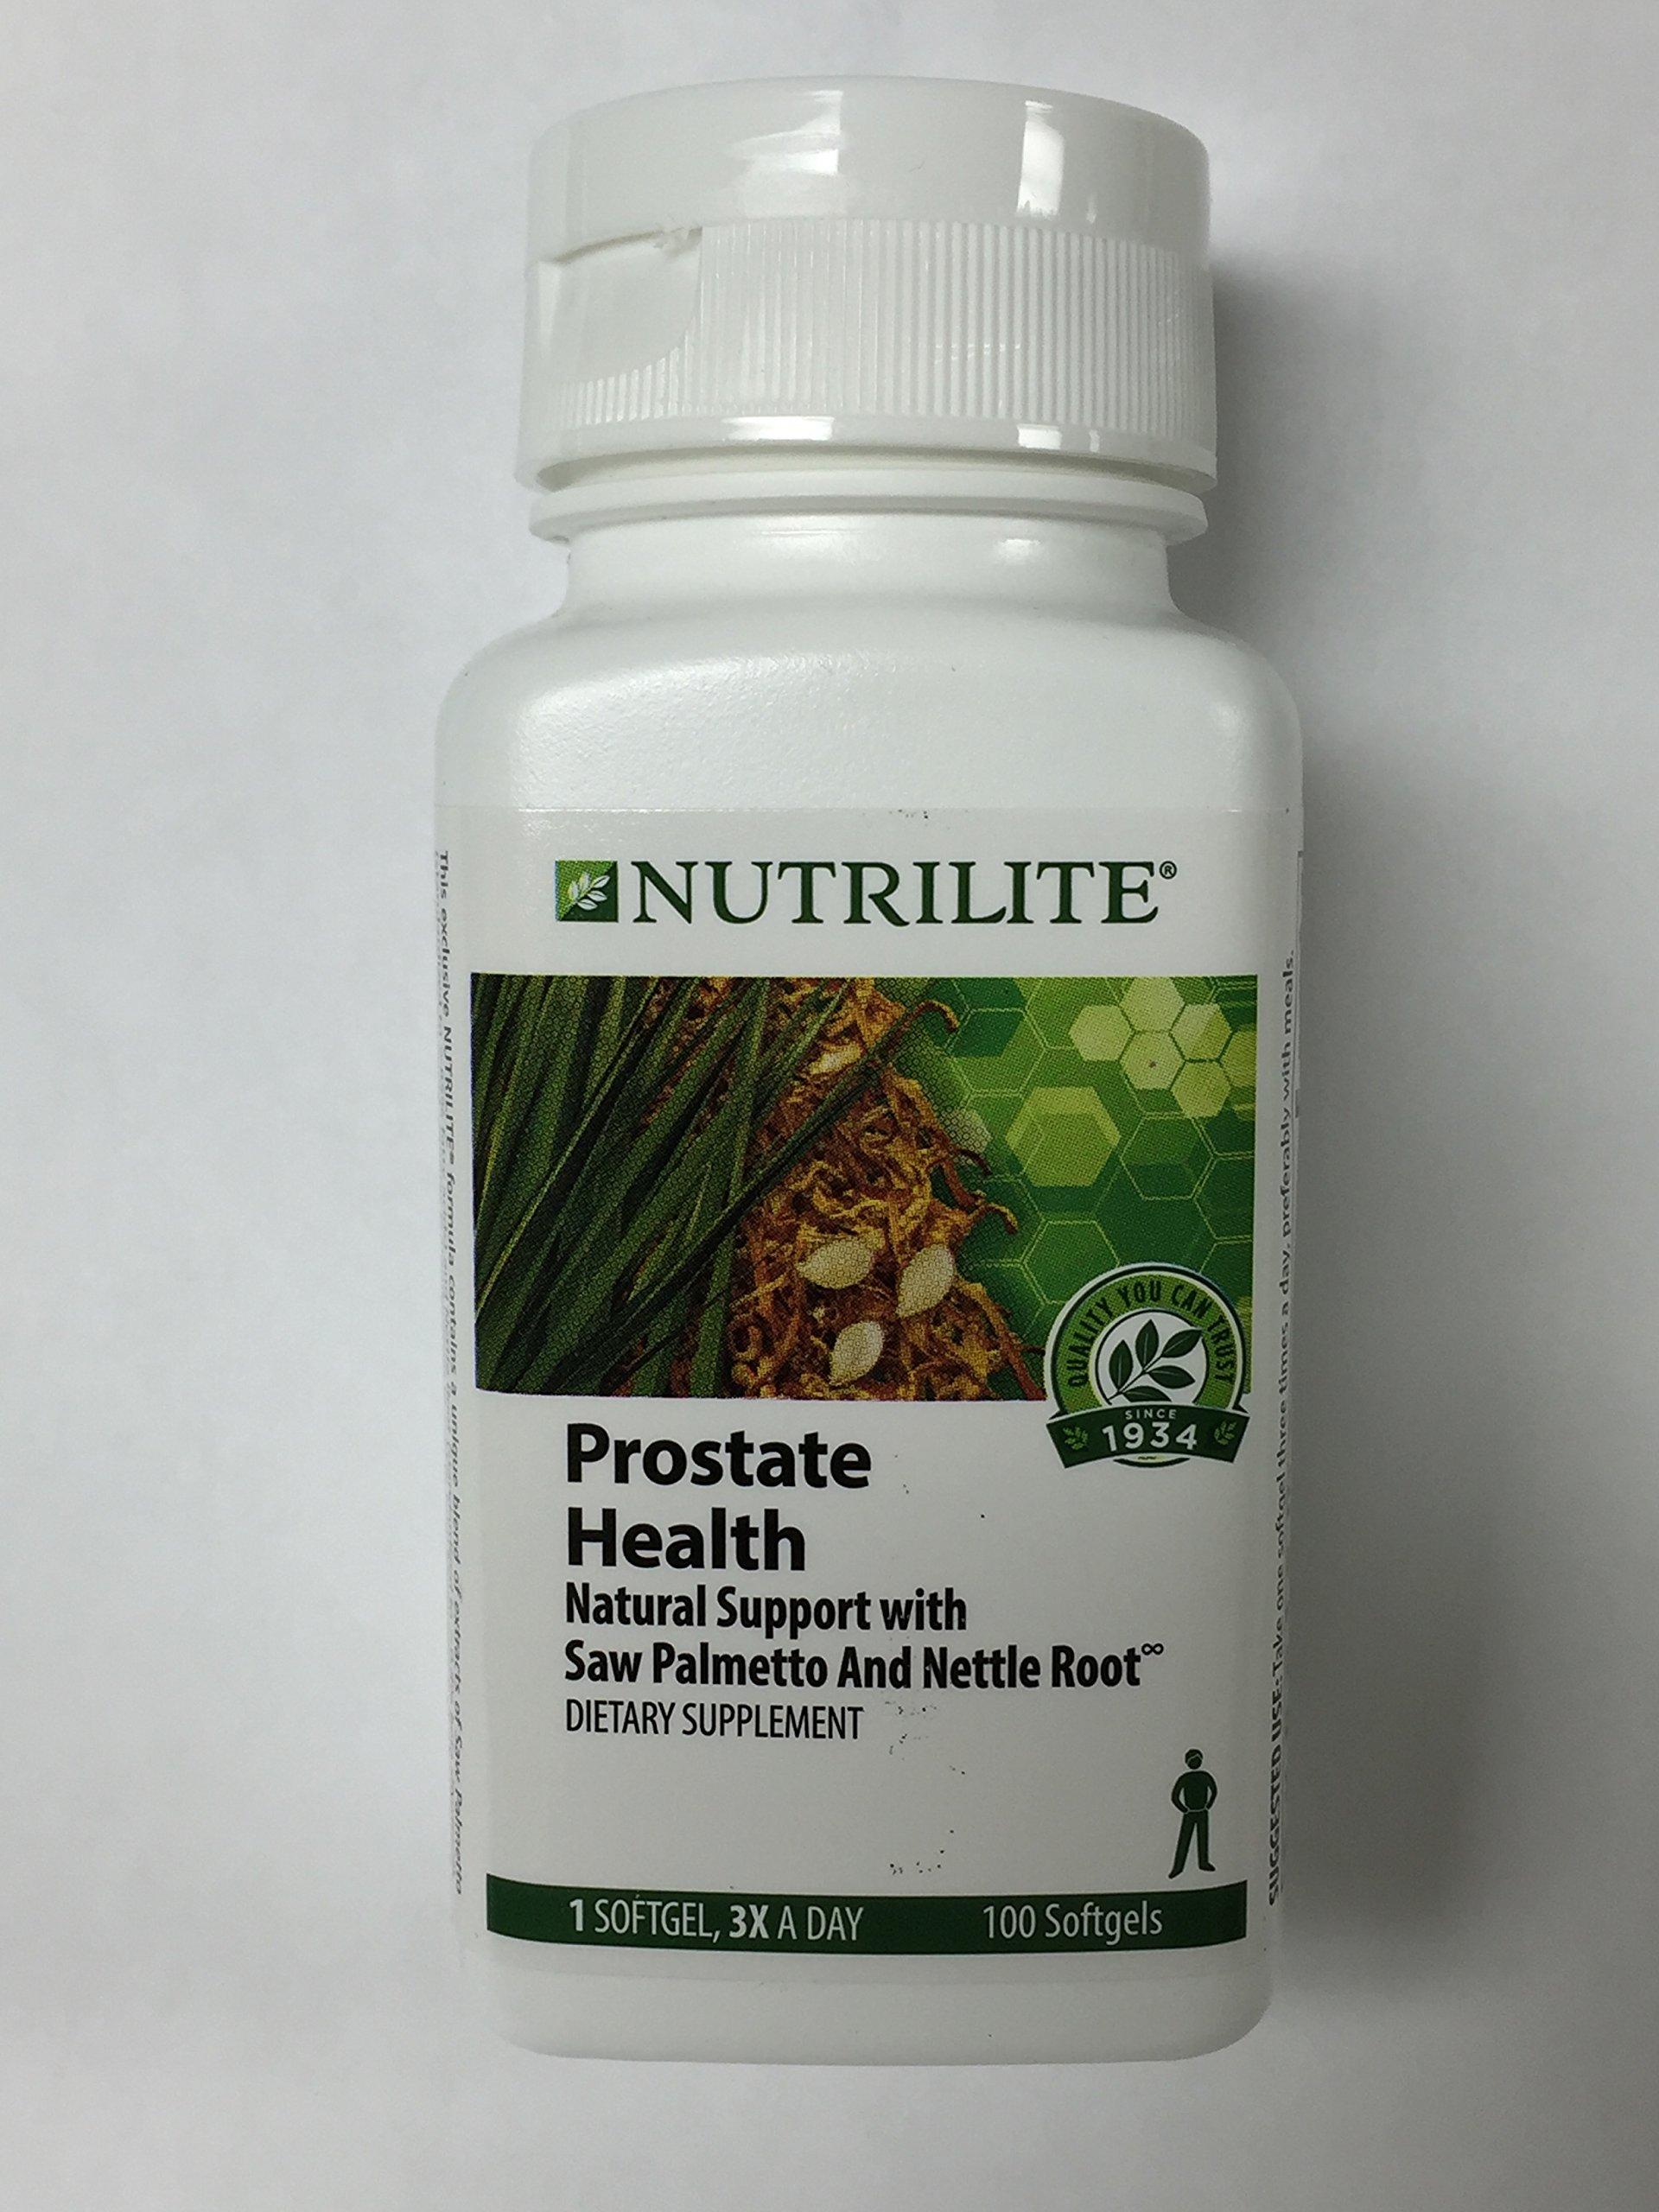 Nutrilite Prostate Health